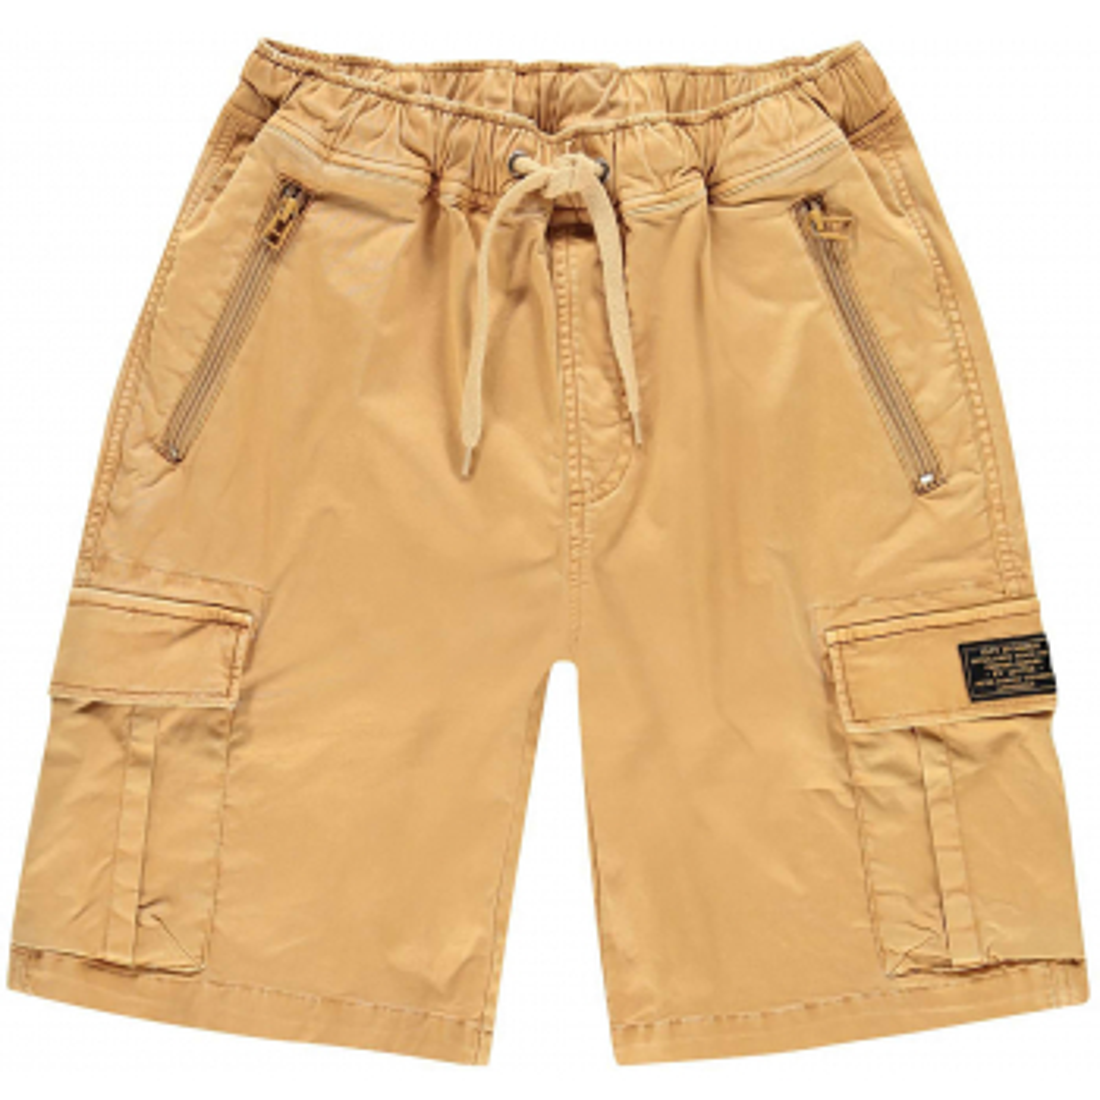 Short voyager shorts taos taupe